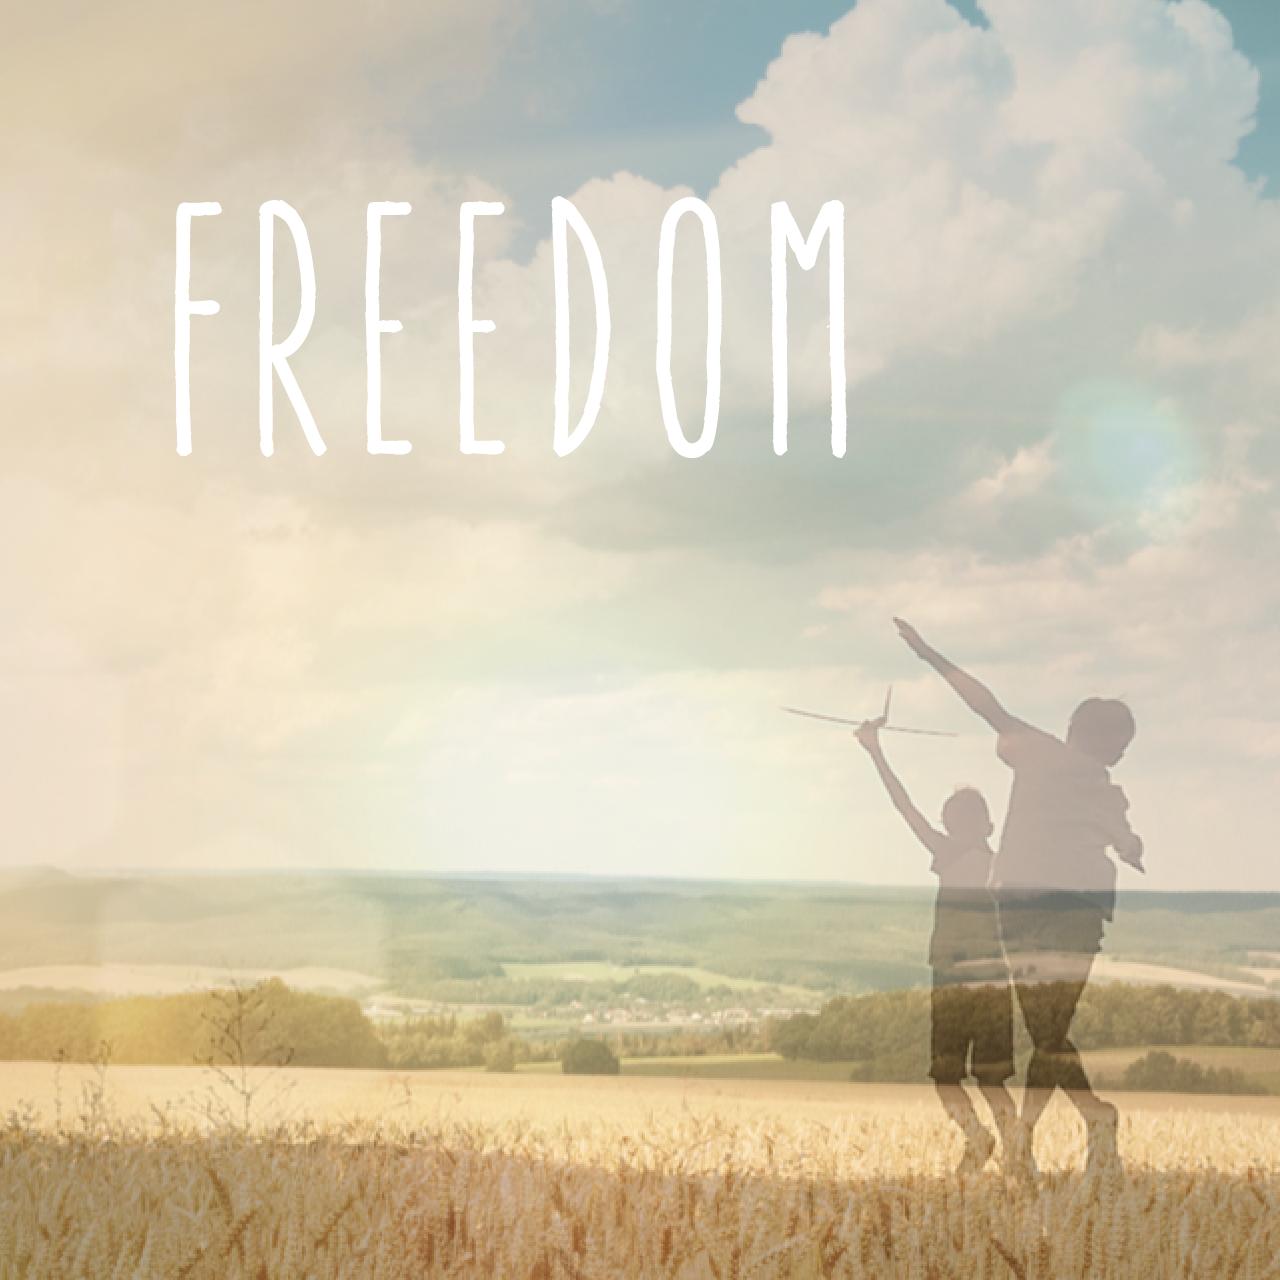 FREEDOMWEBITE&APP SQUARE 290X290.png